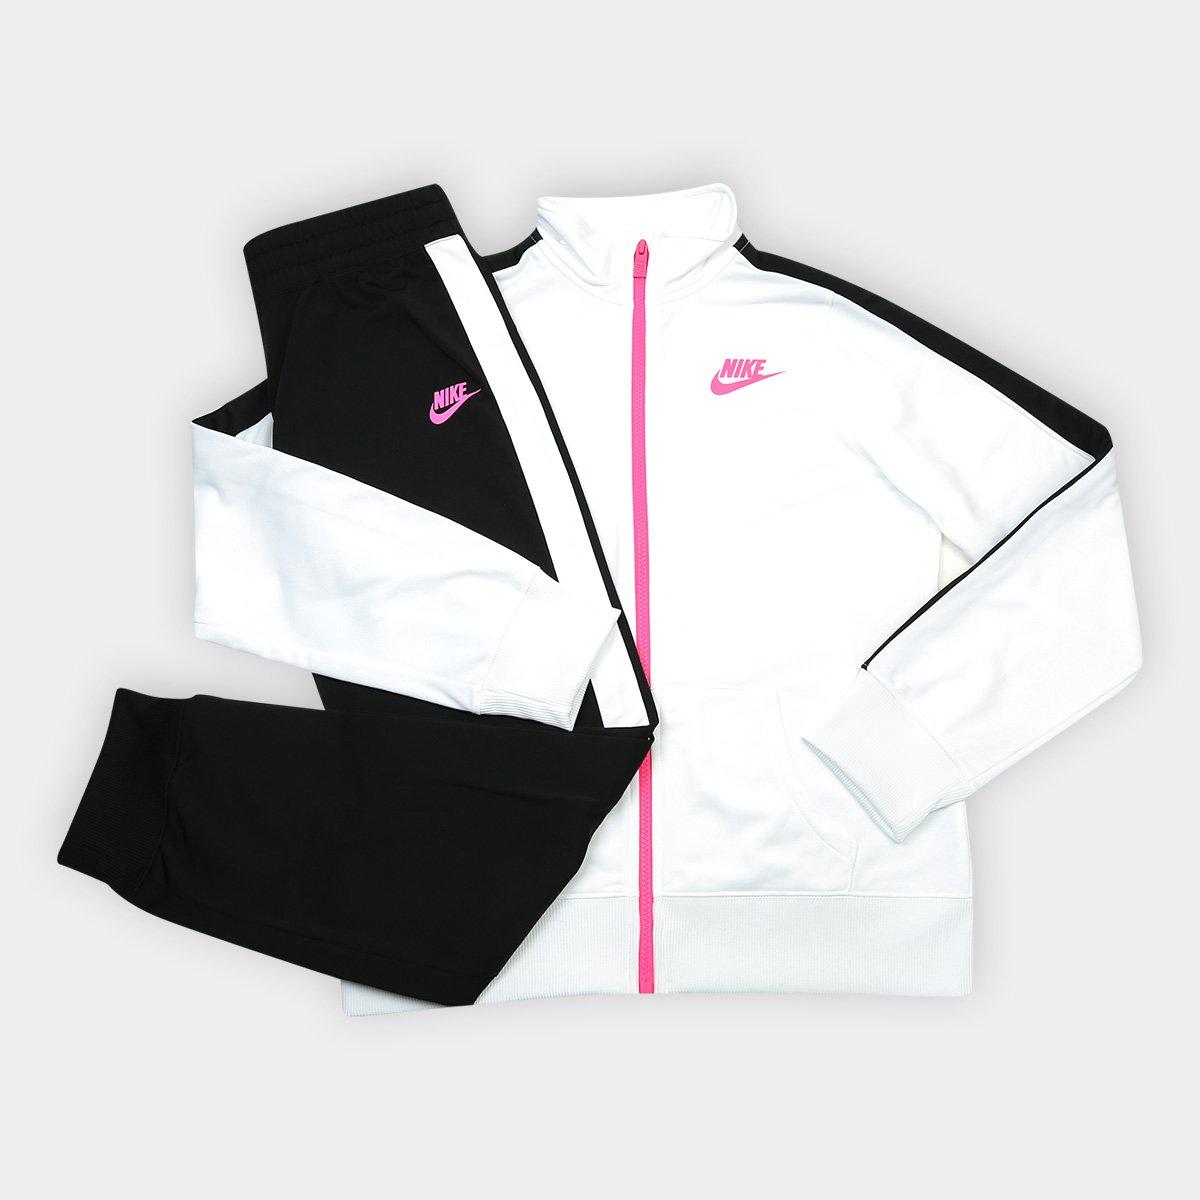 bbacabfa80 Agasalho Nike Sportswear Track Infantil - Compre Agora